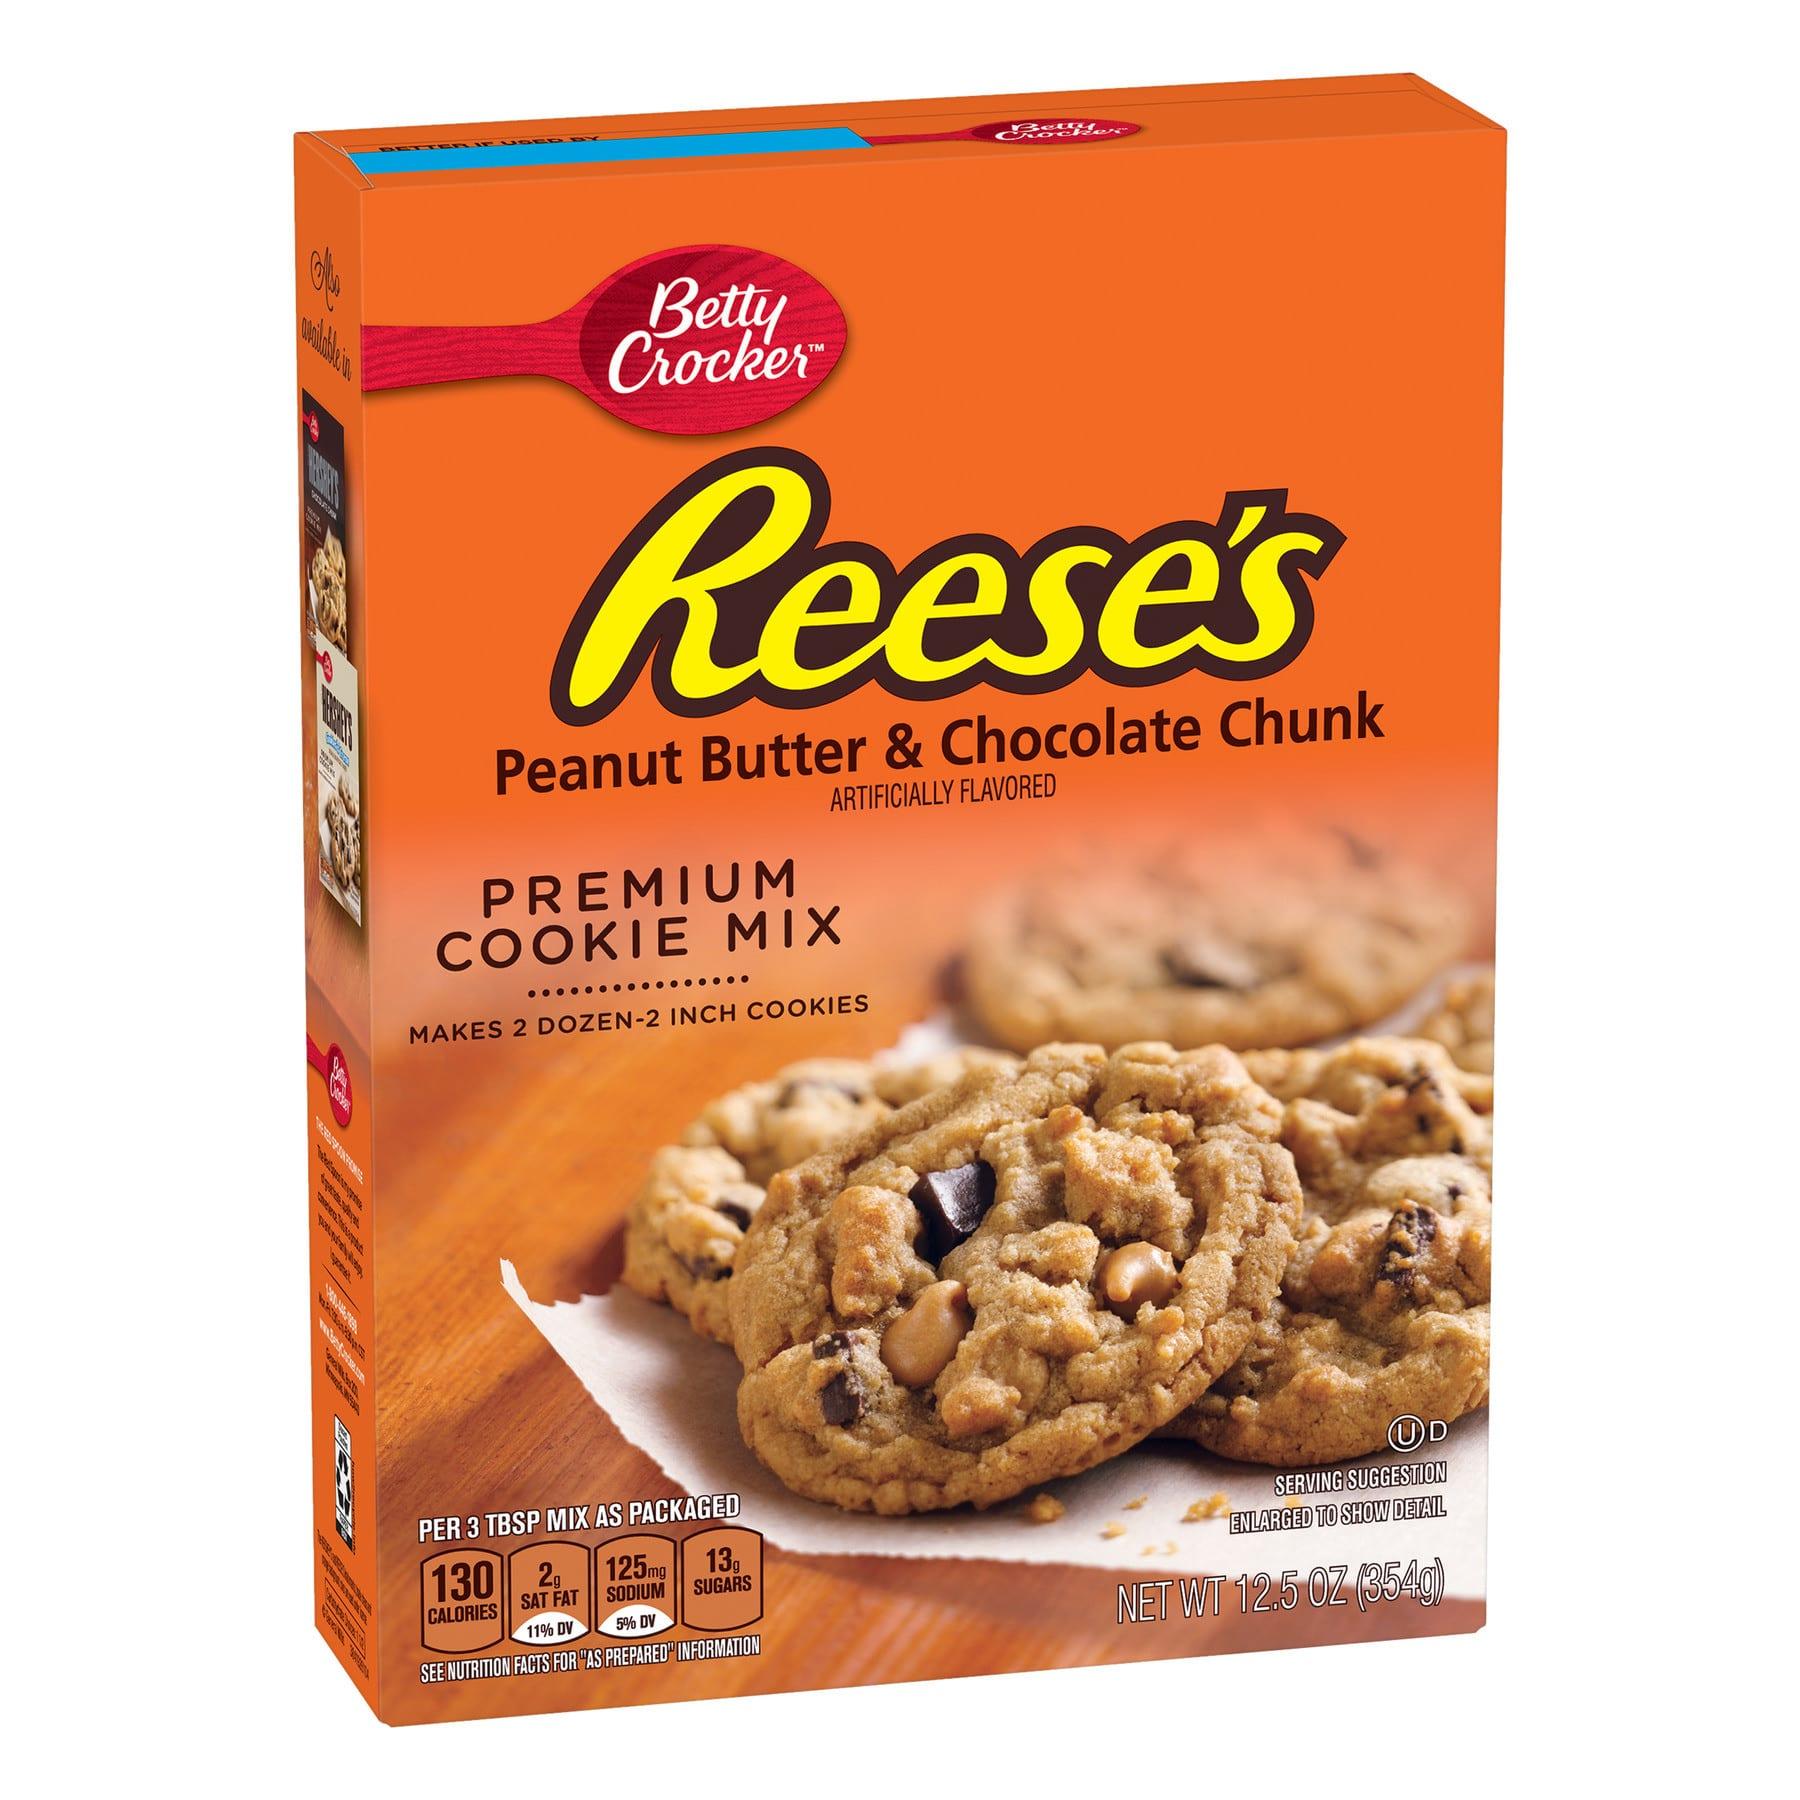 3 Ingredients Peanut Butter Cookies Betty Crocker Reese S Peanut